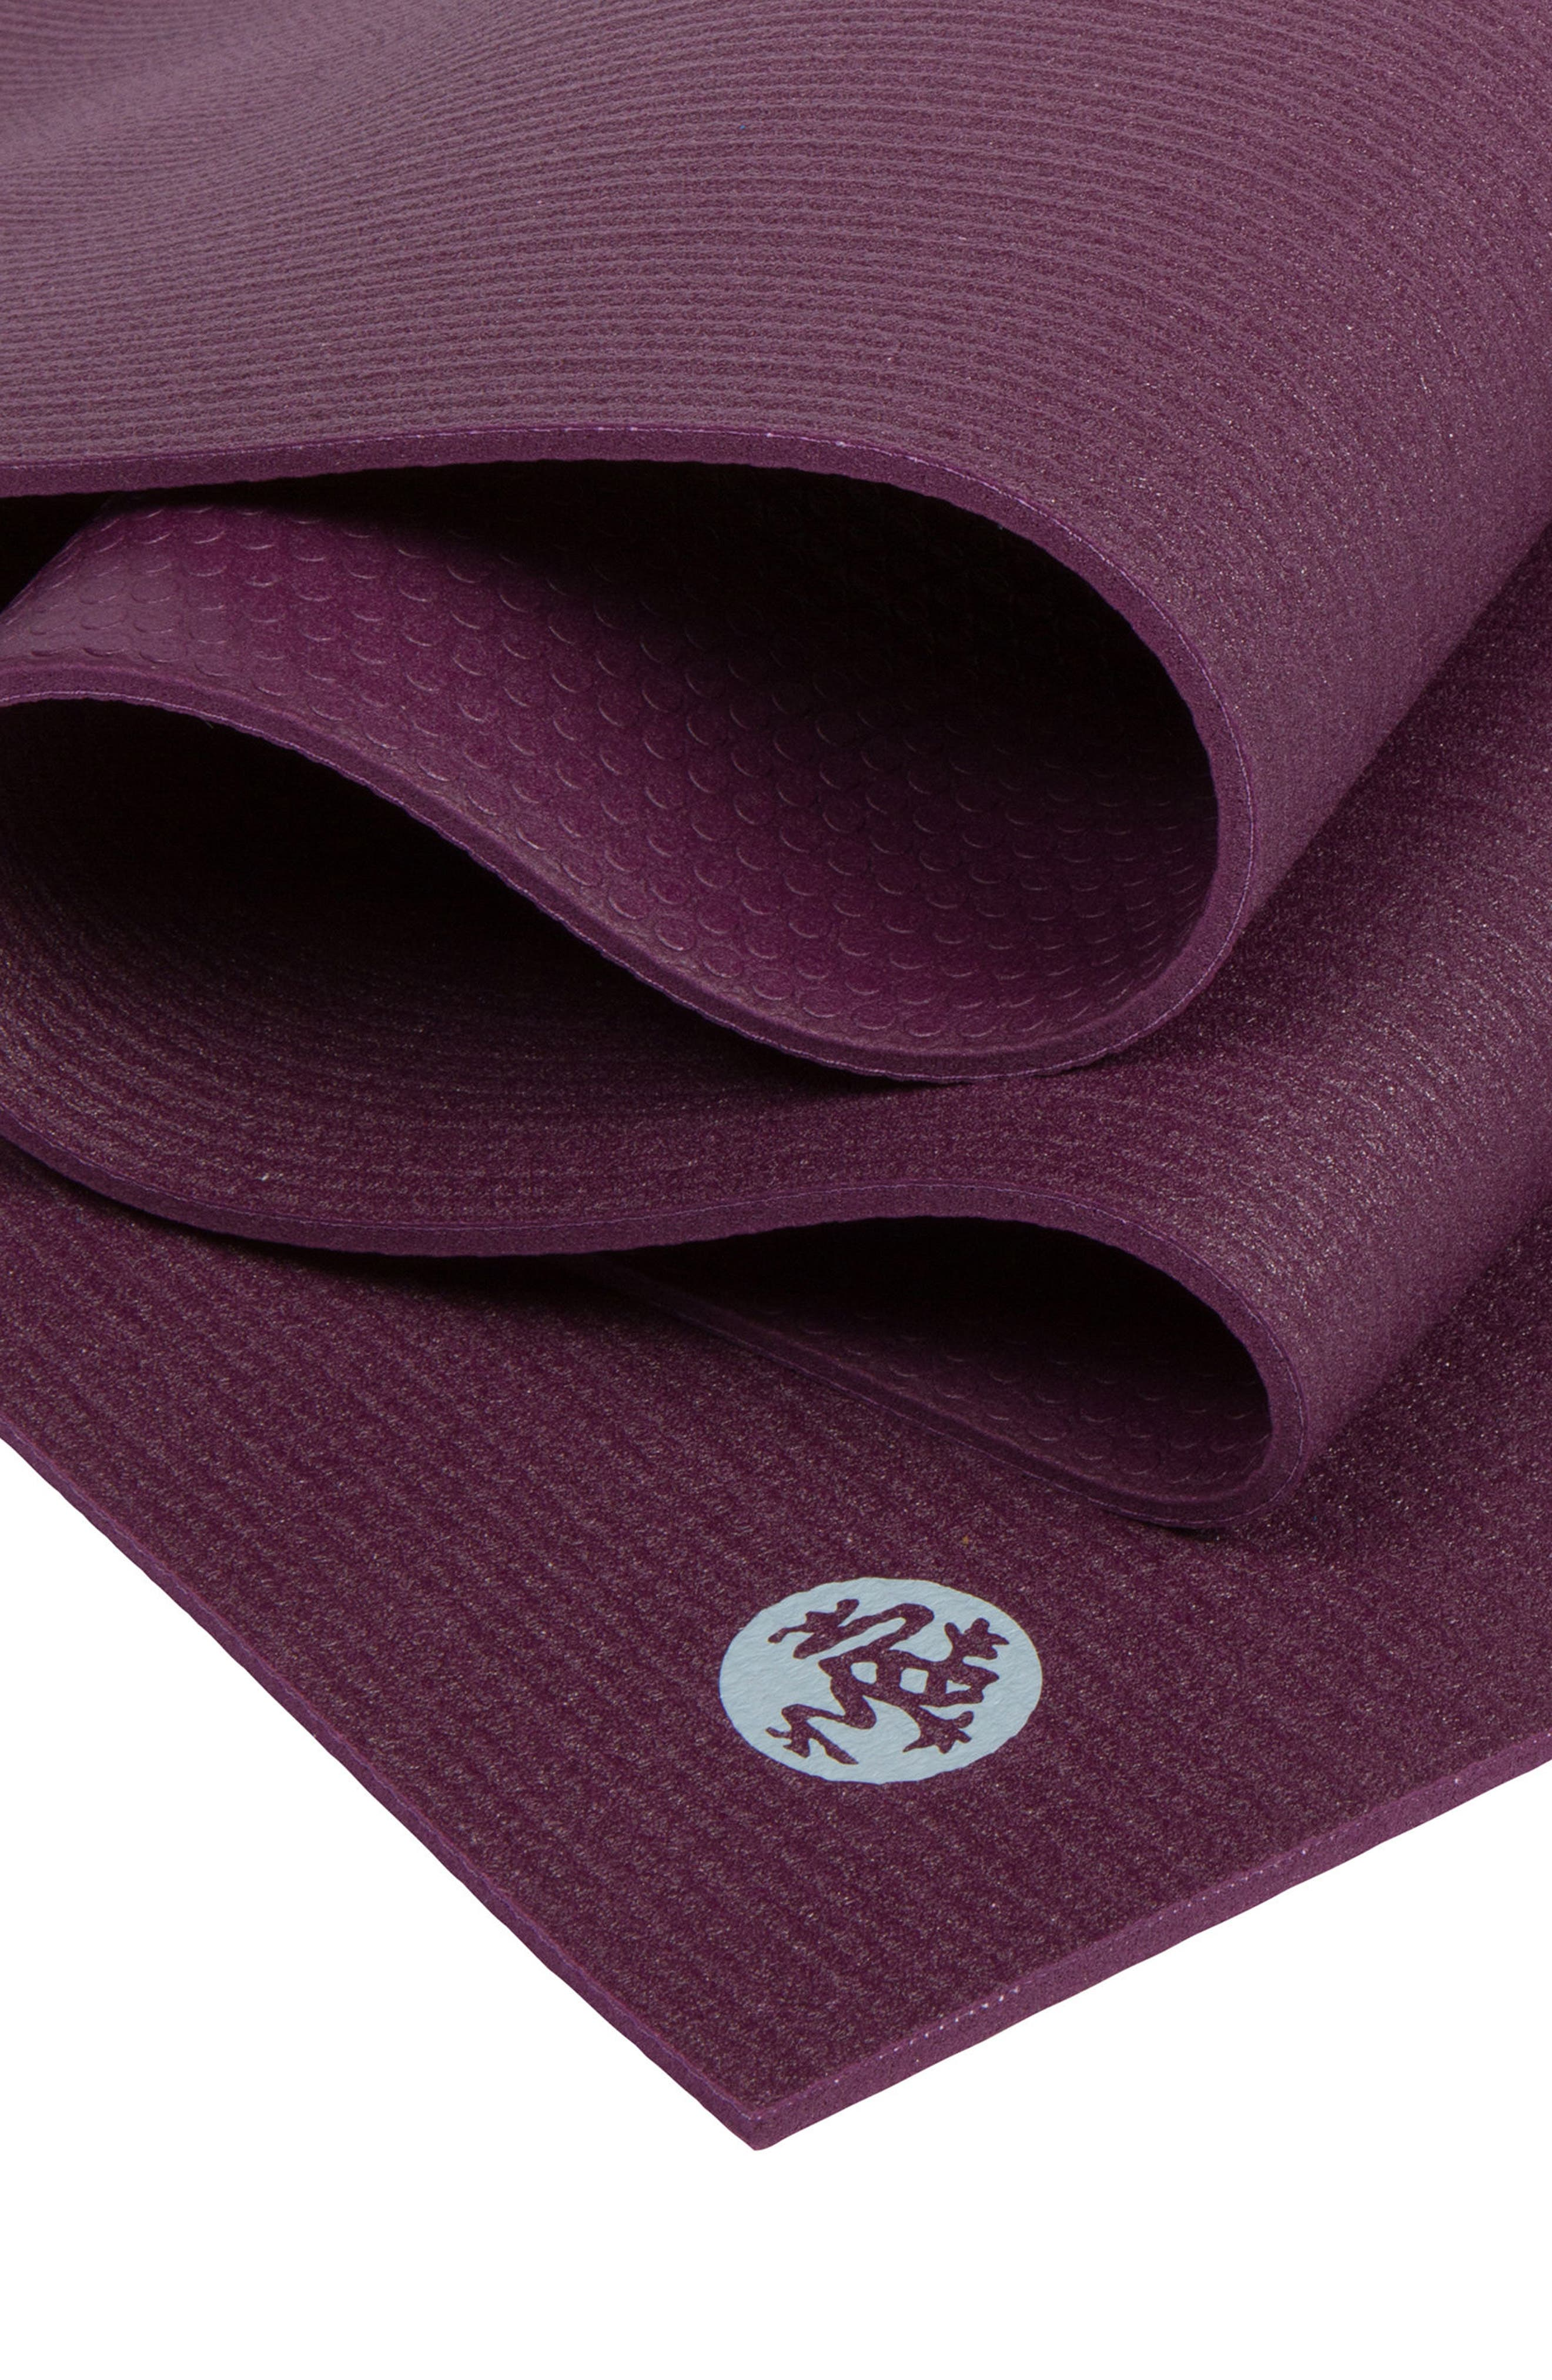 PROlite<sup>®</sup> Yoga Mat,                             Alternate thumbnail 3, color,